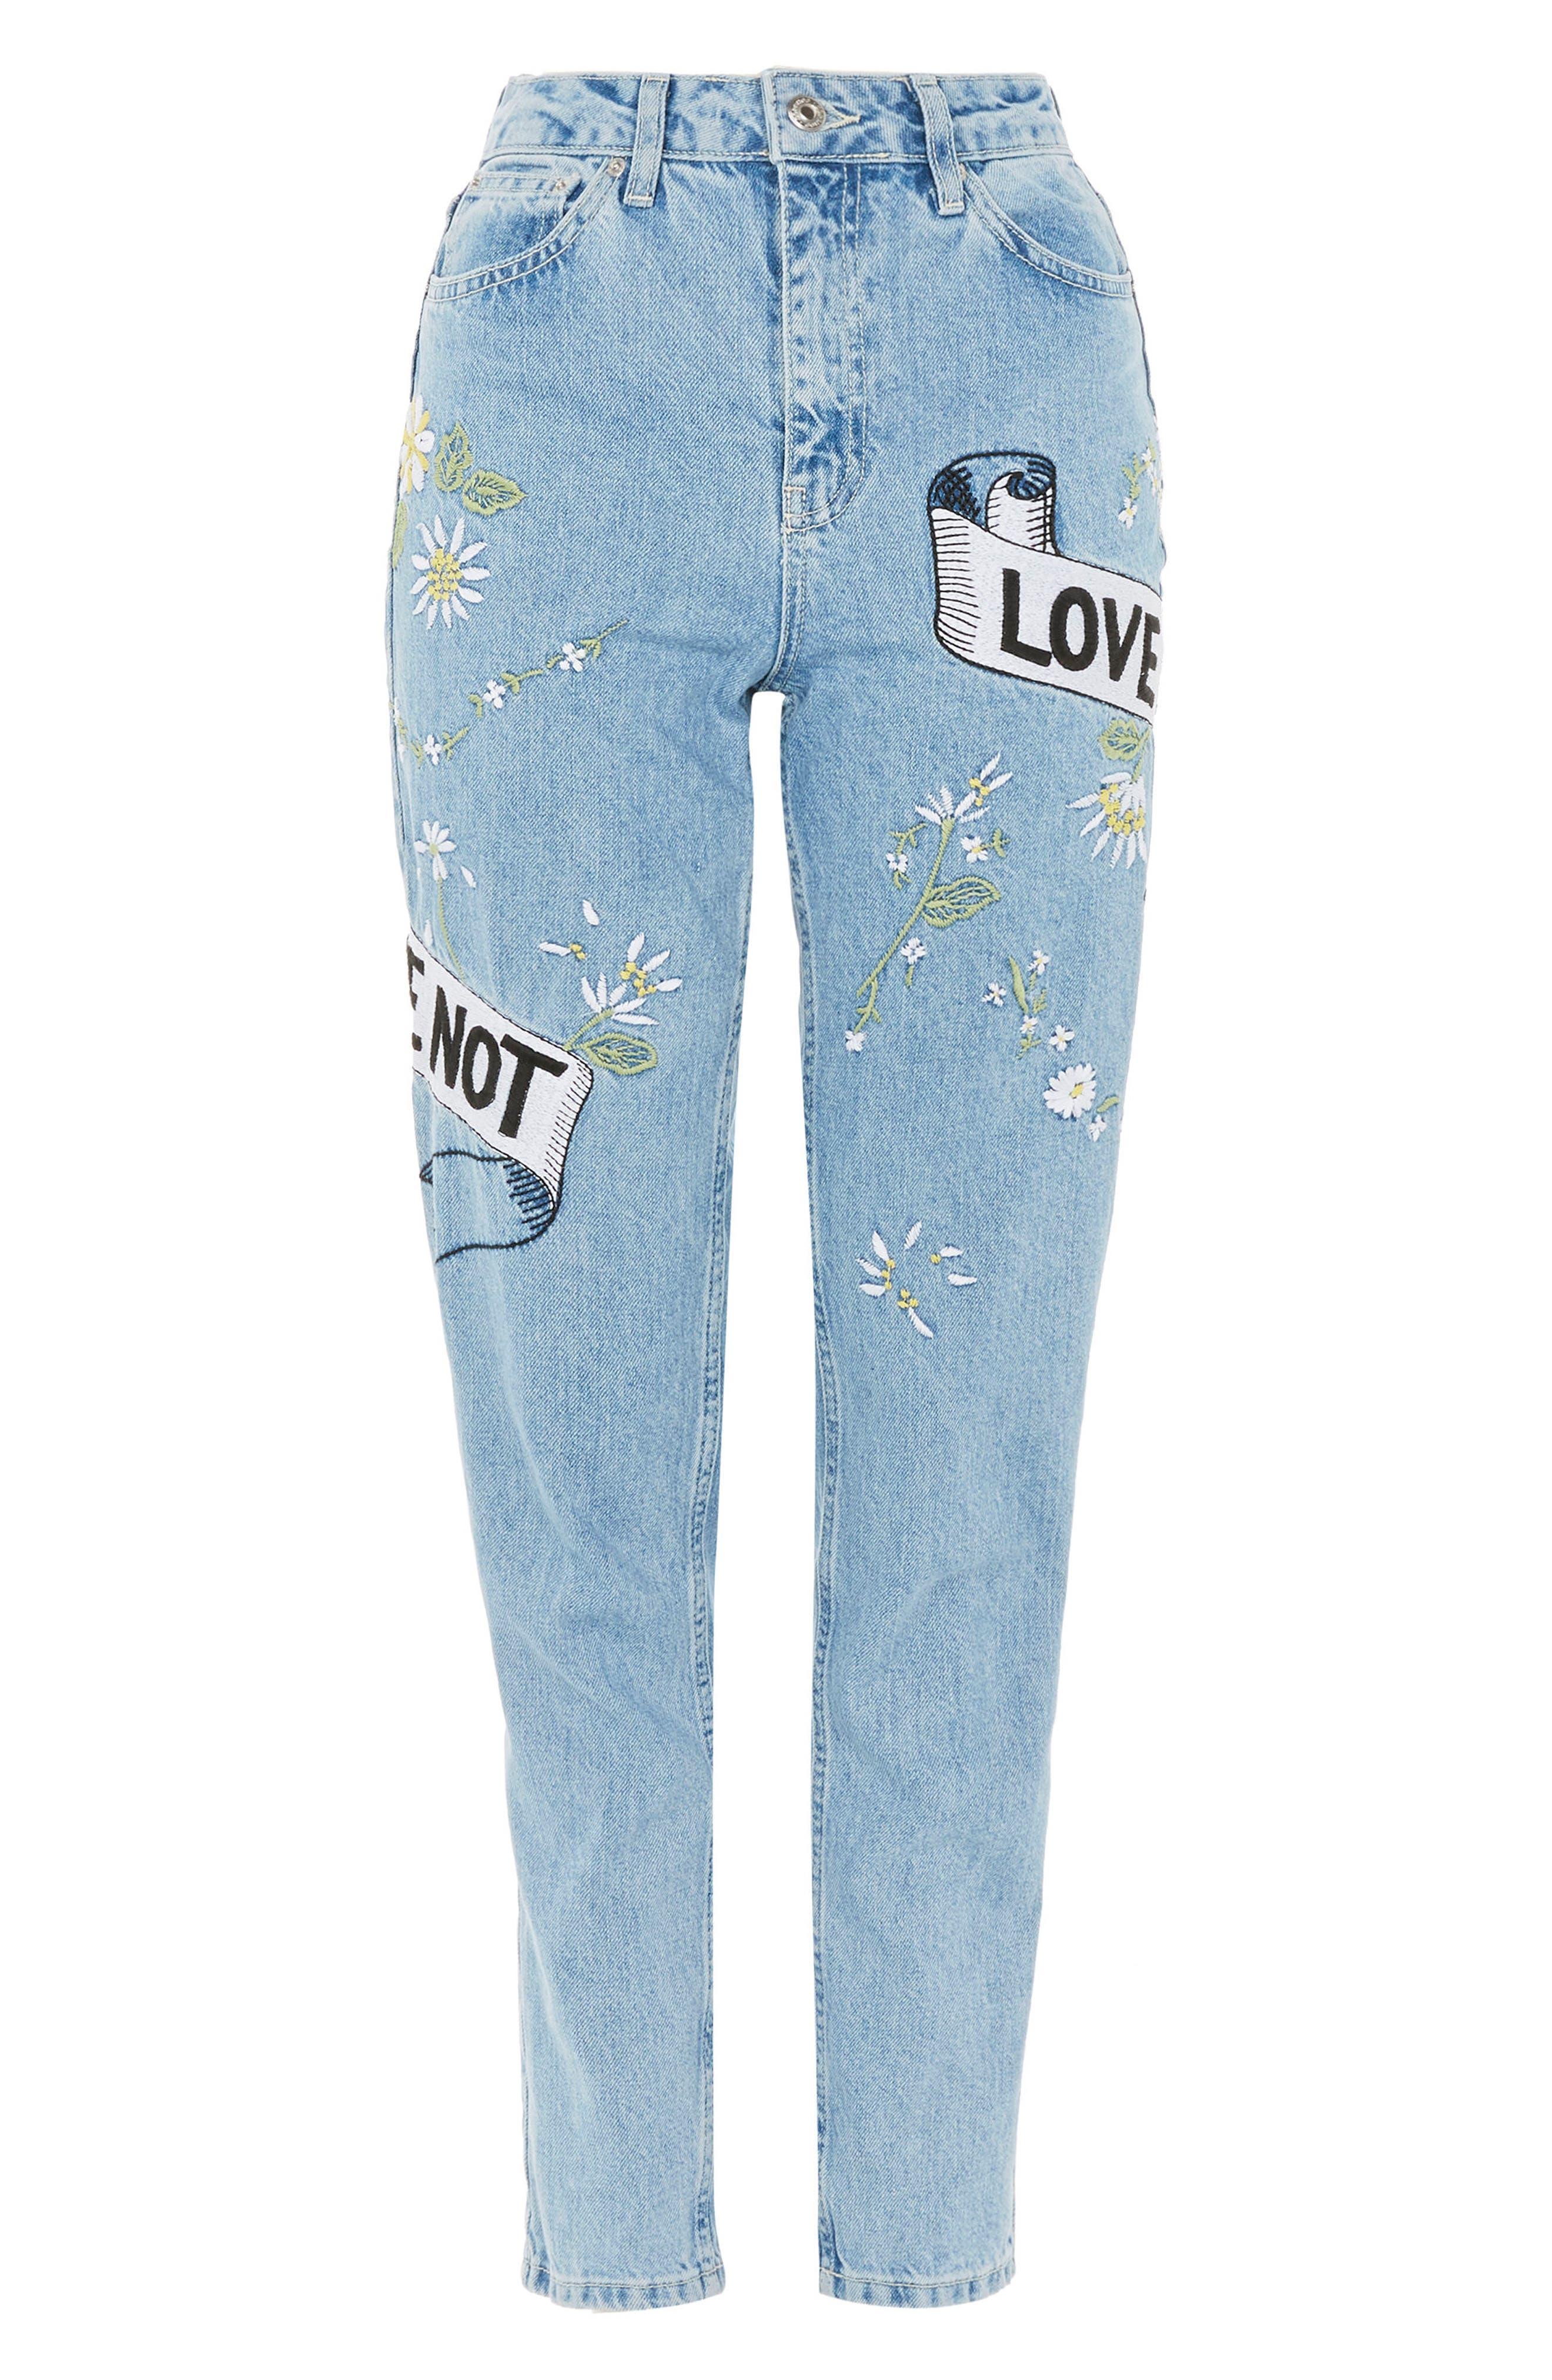 Love Me Bleach Mom Jeans,                             Alternate thumbnail 5, color,                             Light Blue